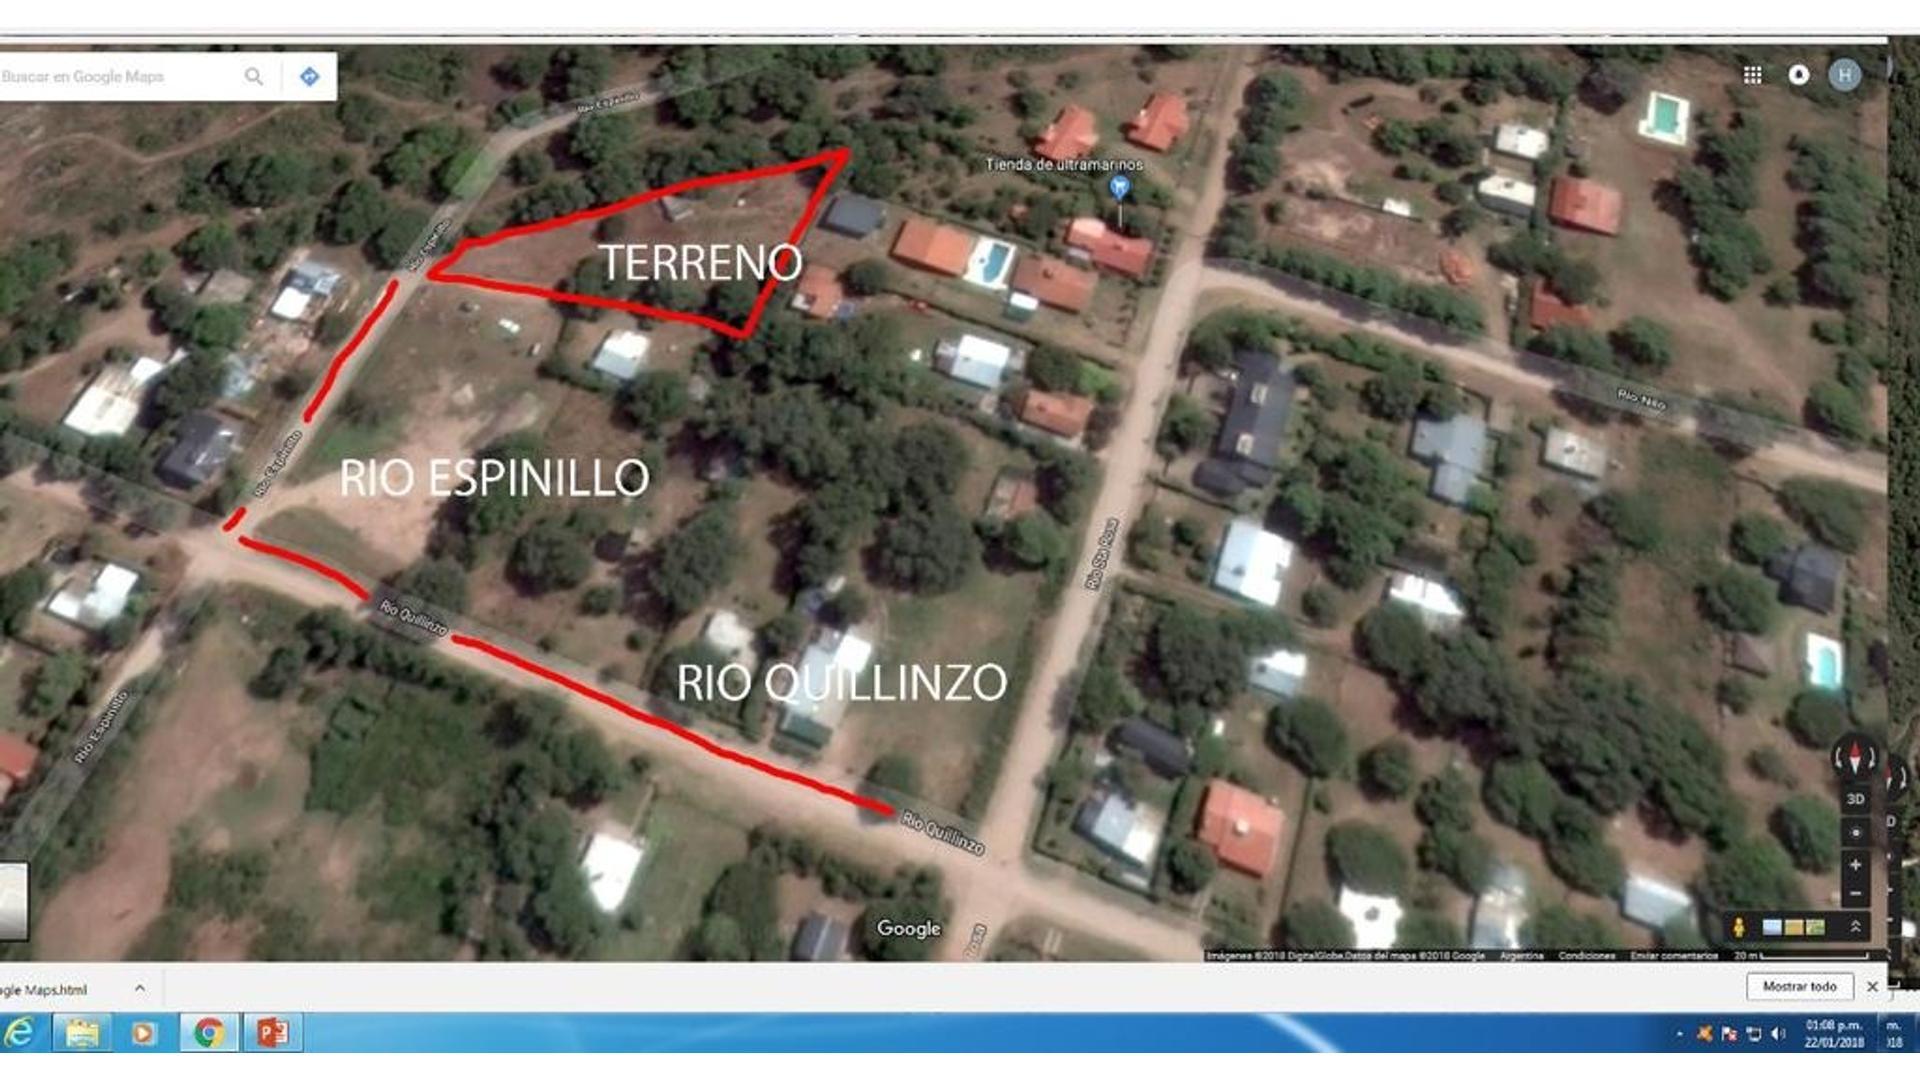 Villa General Belgrano 100 - U$D 43.000 - Terreno en Venta